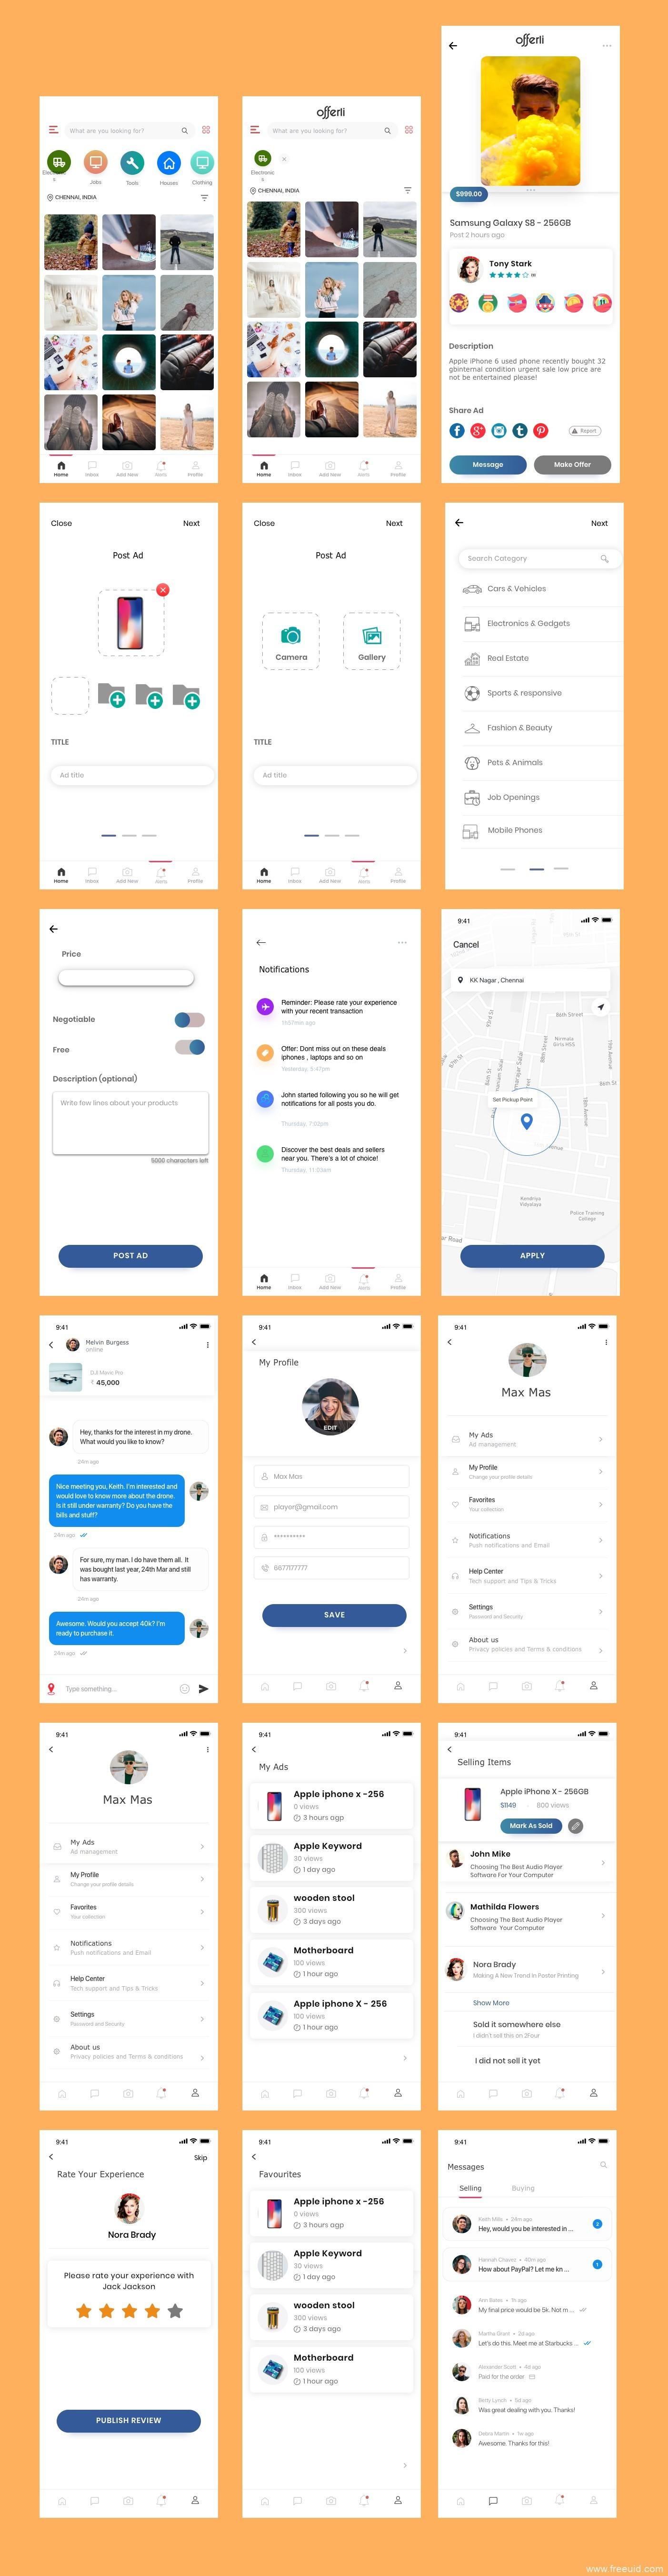 Ins风照片分享、社交、买卖App应用 UI 界面sketch源文件下载